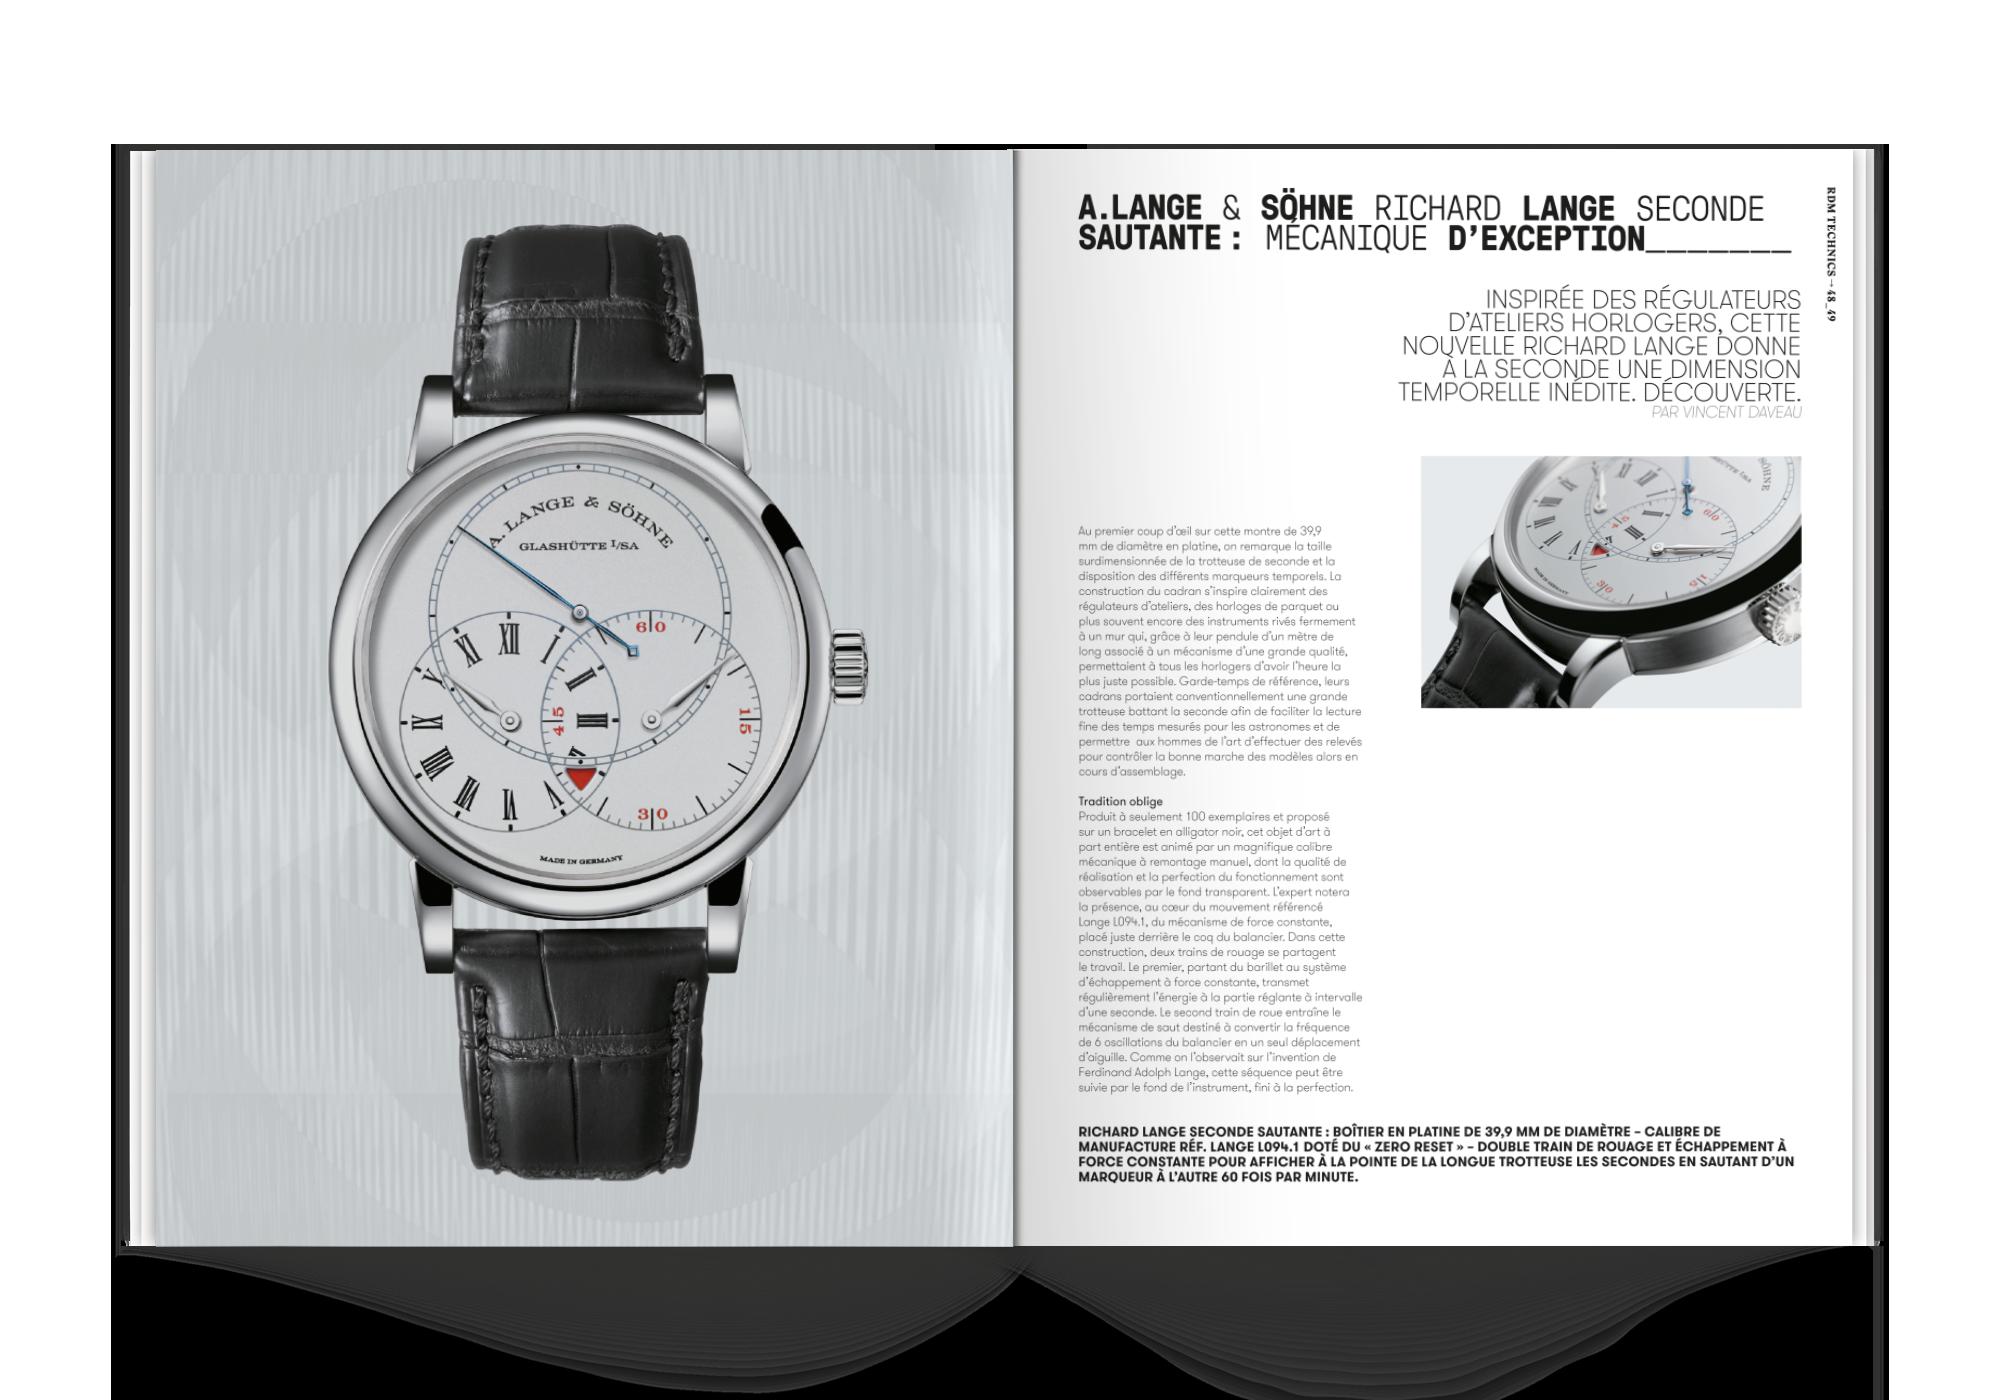 magazine français de haute horlogerie